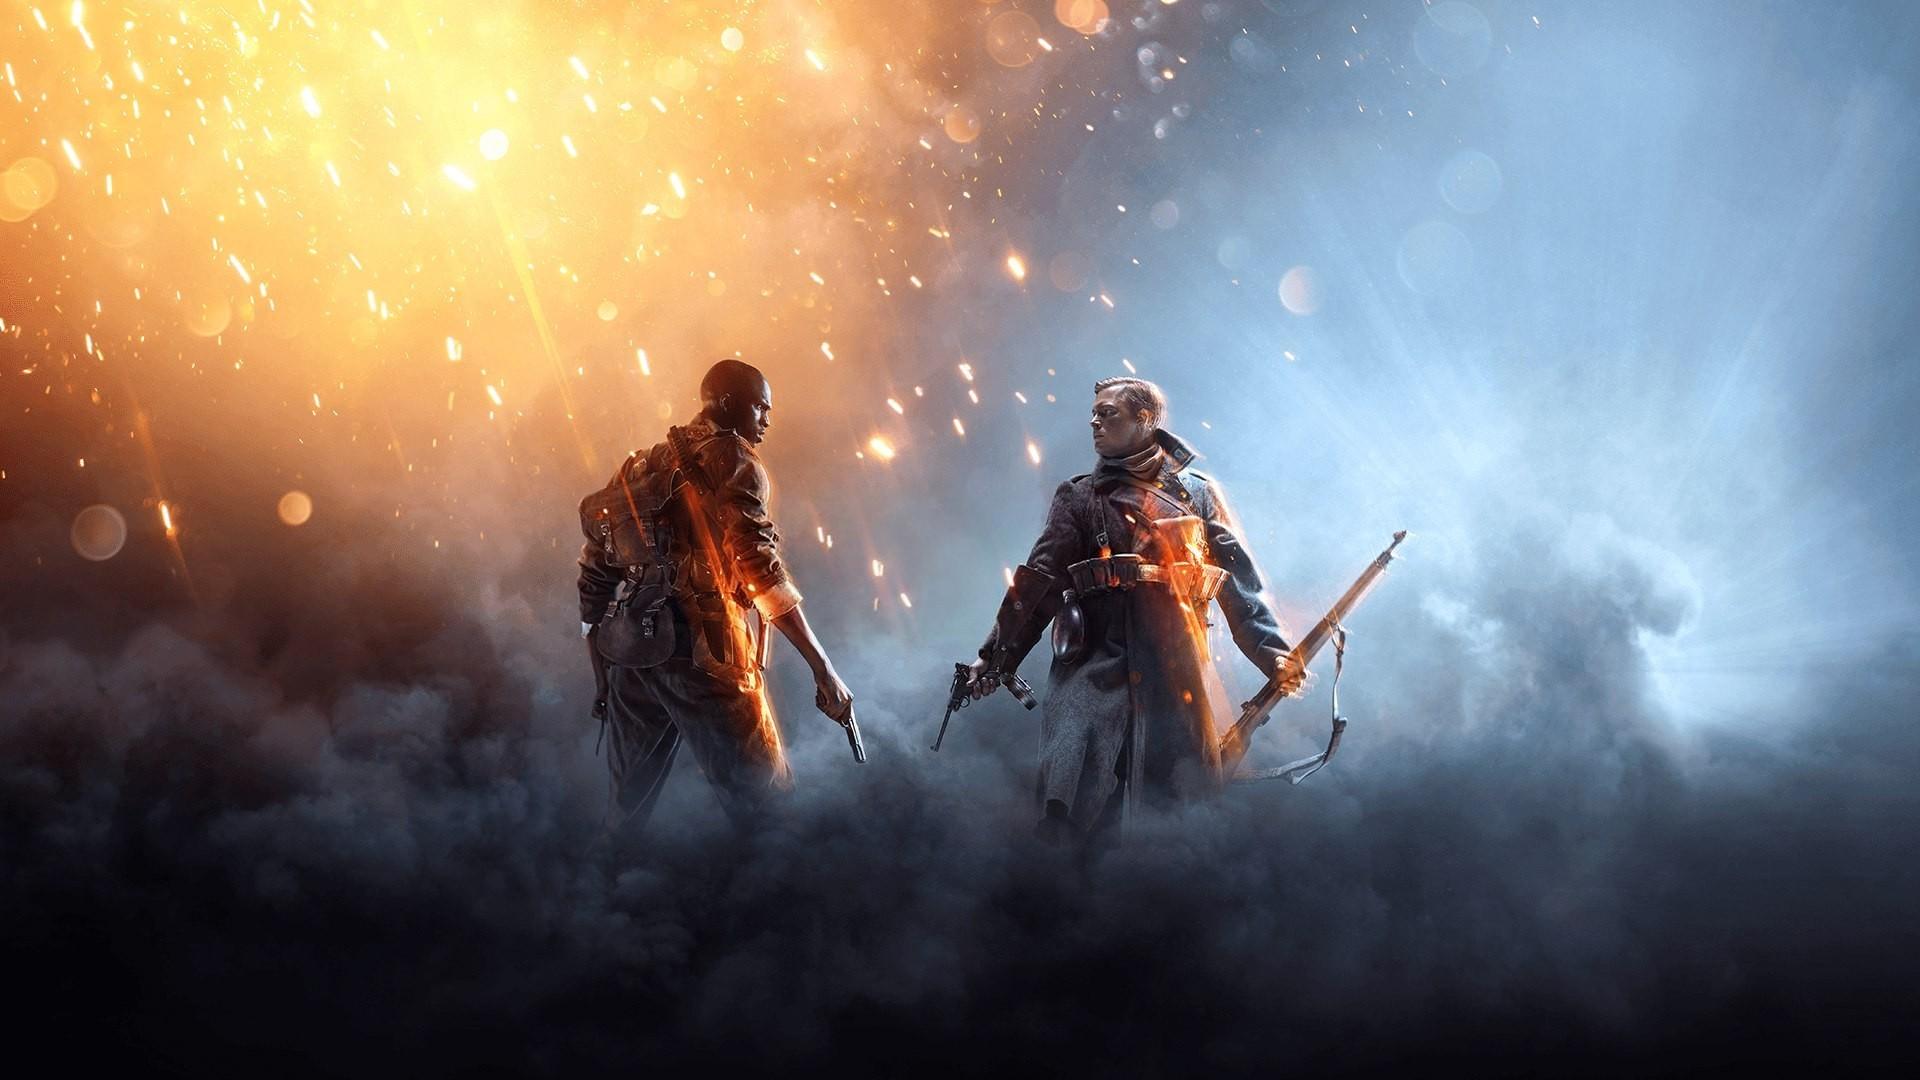 Battlefield 1 clipart jpg freeuse 233 Battlefield 1 HD Wallpapers   Backgrounds - Wallpaper Abyss jpg freeuse